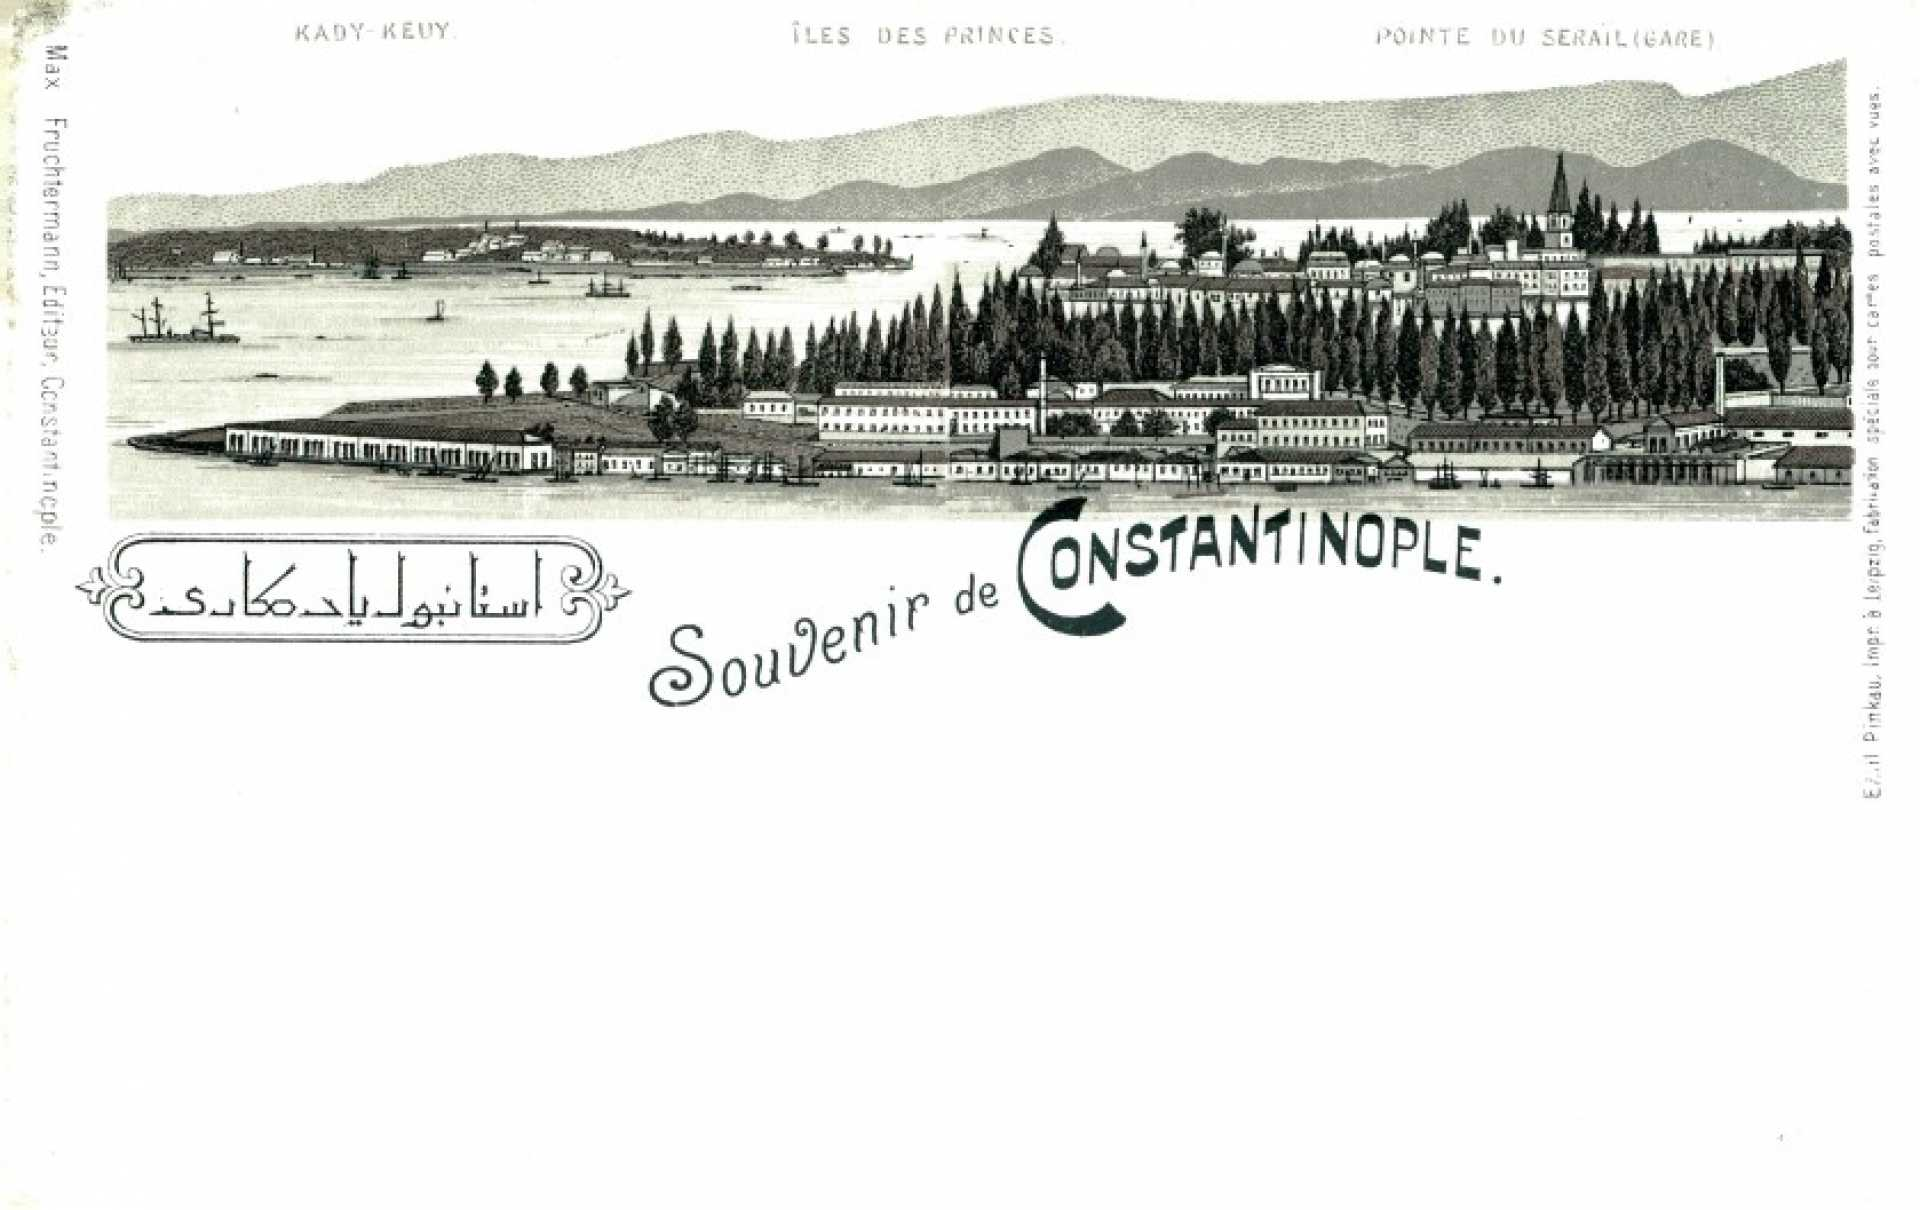 Souvenir de Constantinople. Kady-Keuy. İles des Prices. Pointe du Serail (gare)